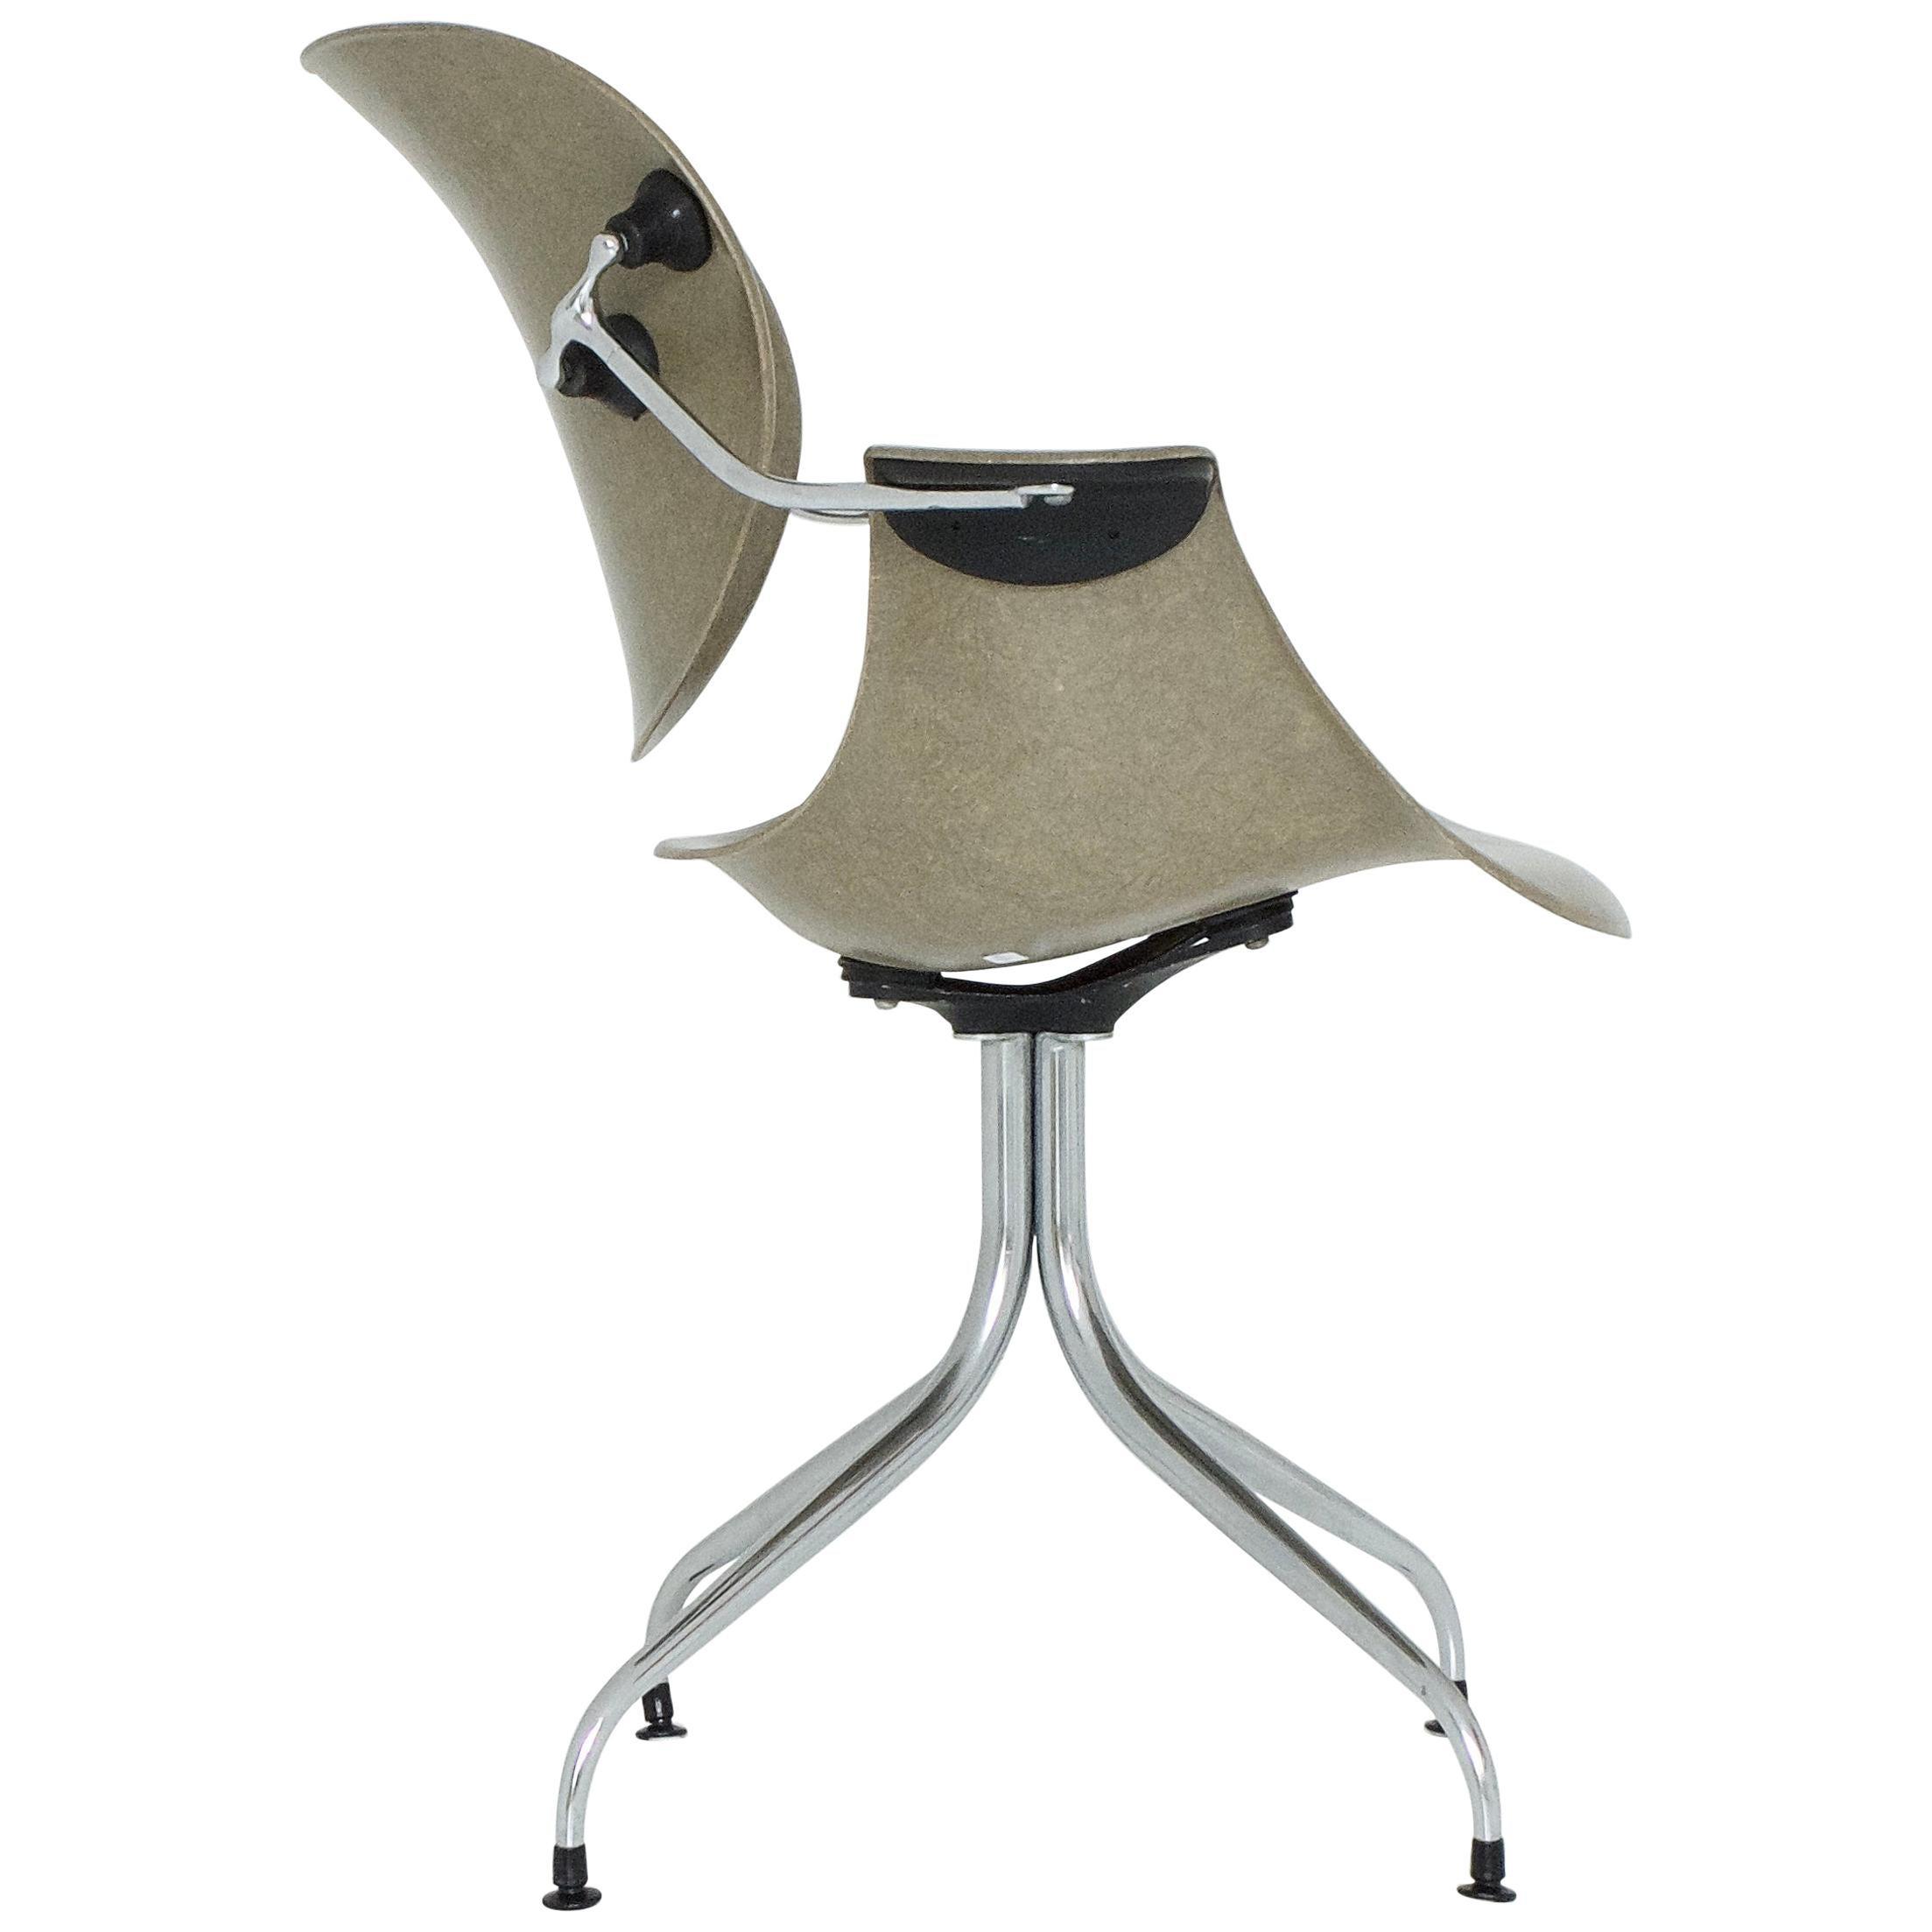 Office Swag Leg Chair DAA by George Nelson vor Herman Miller, 1958